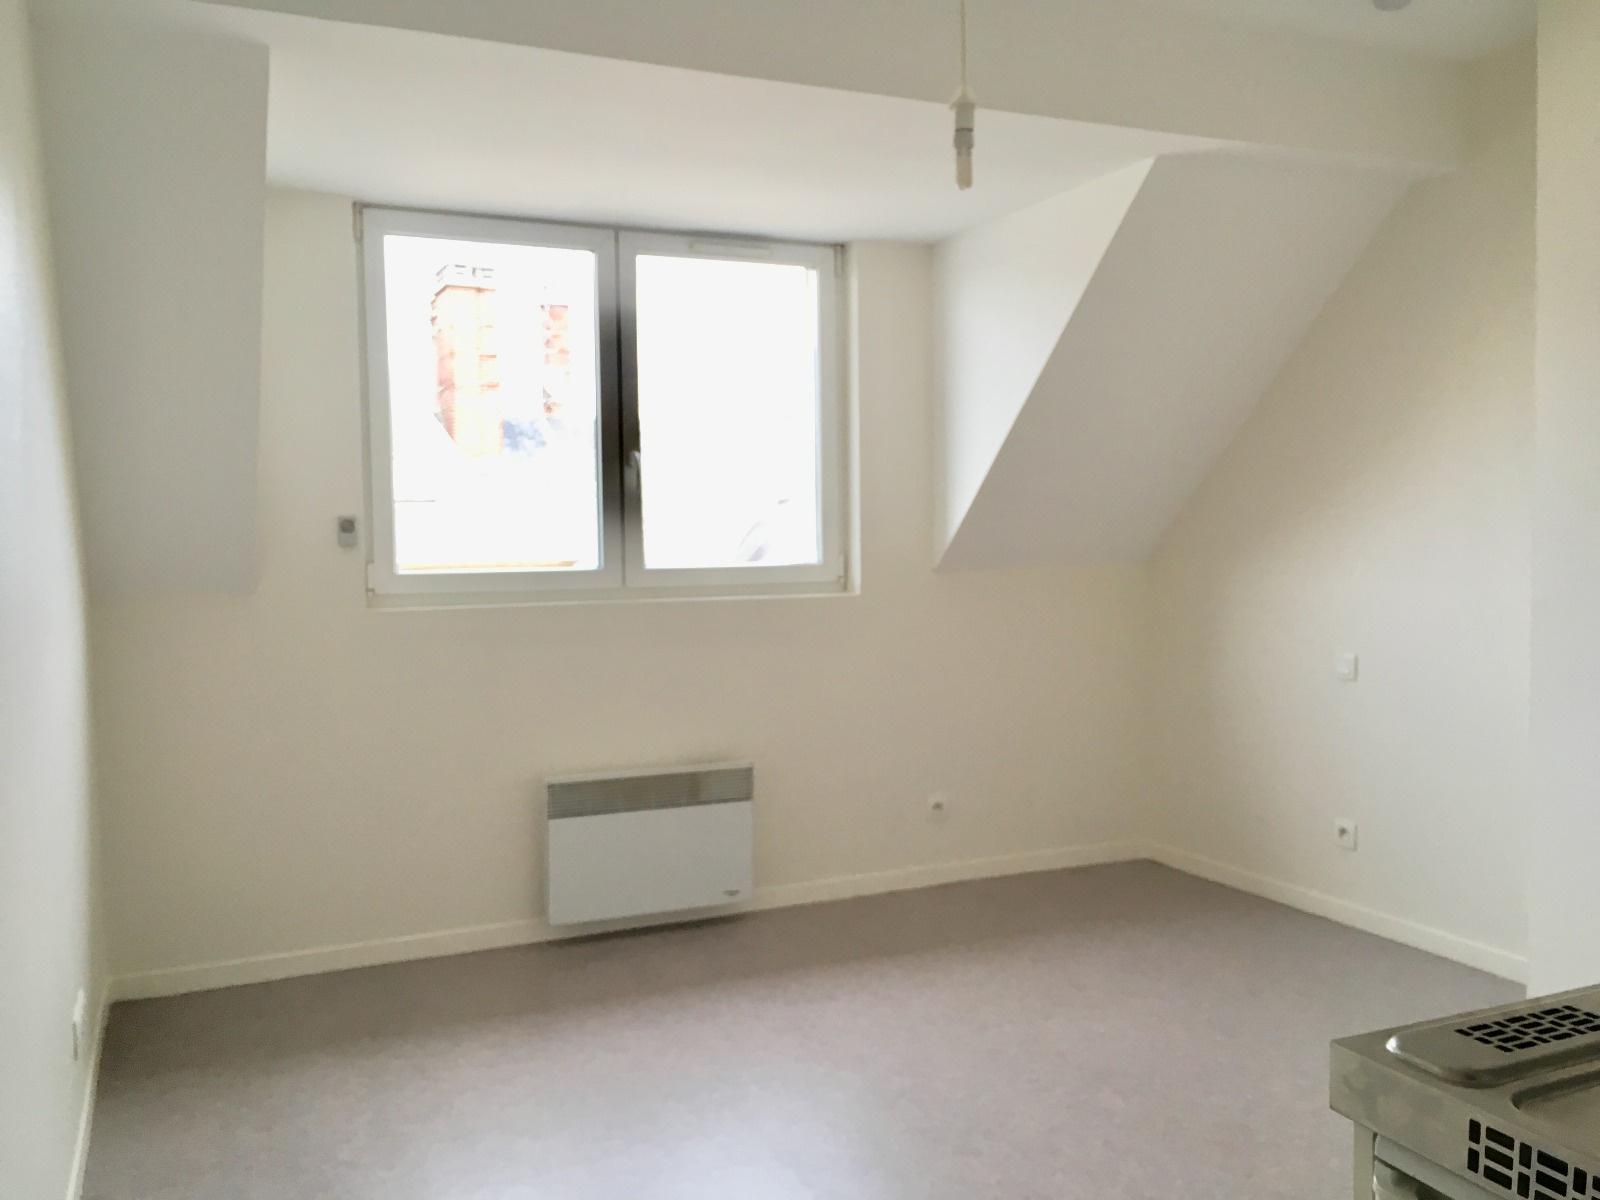 location rue pietonne 25 m2 moderne comprenant s jour avec. Black Bedroom Furniture Sets. Home Design Ideas